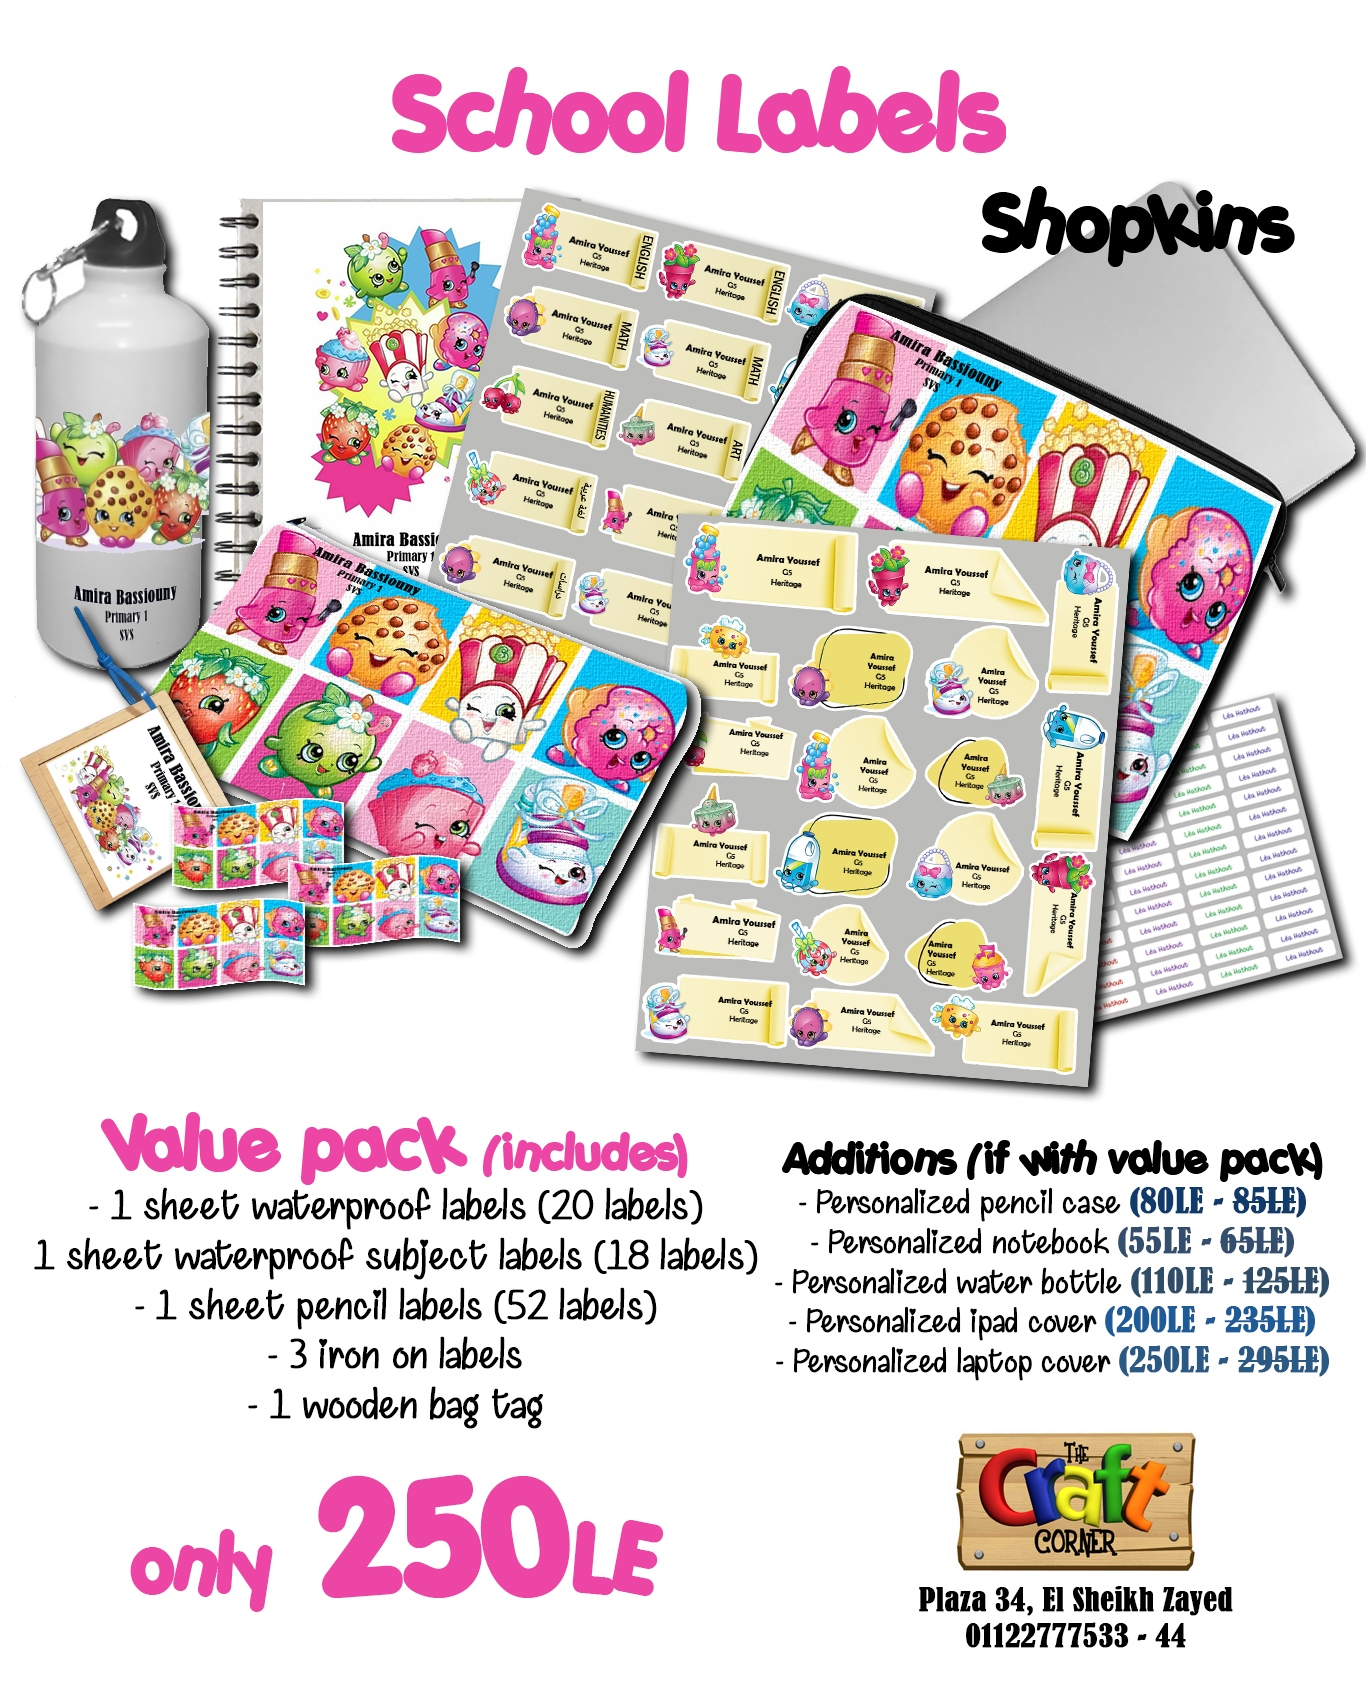 Shopkins ad